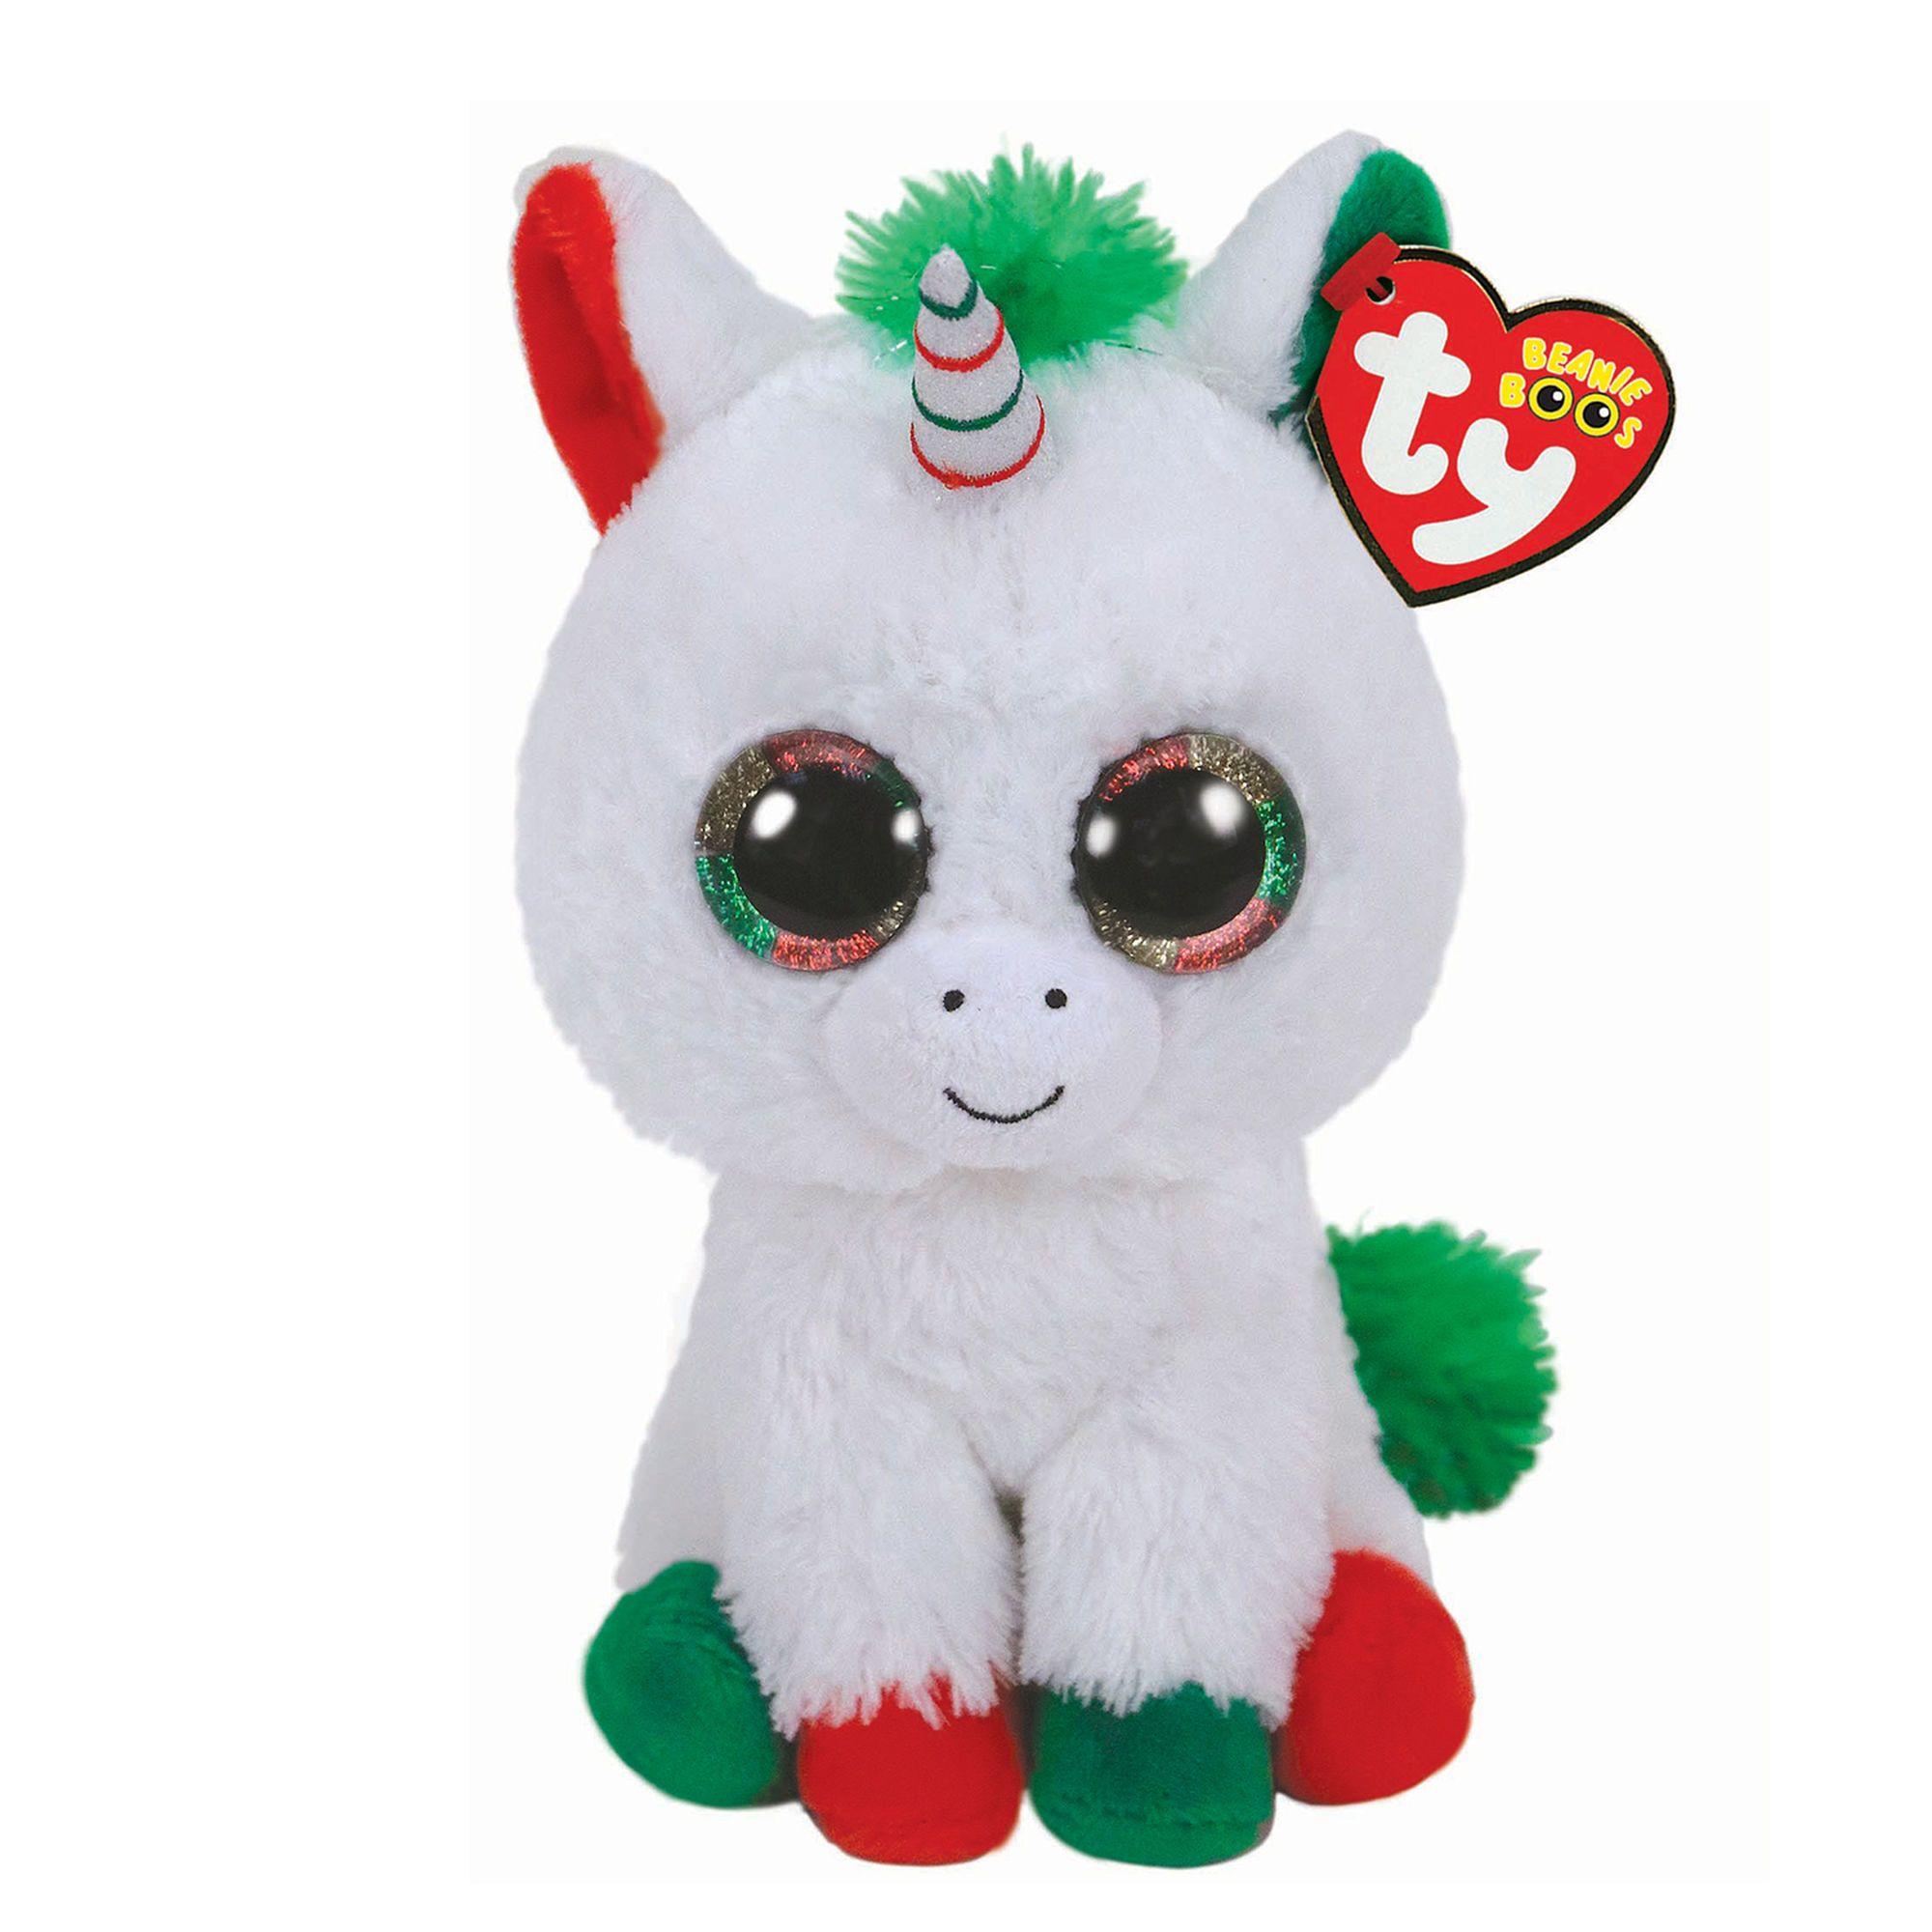 bb0054d2ca0 Ty Beanie Boo Medium Candy Cane the Unicorn Plush Toy ...